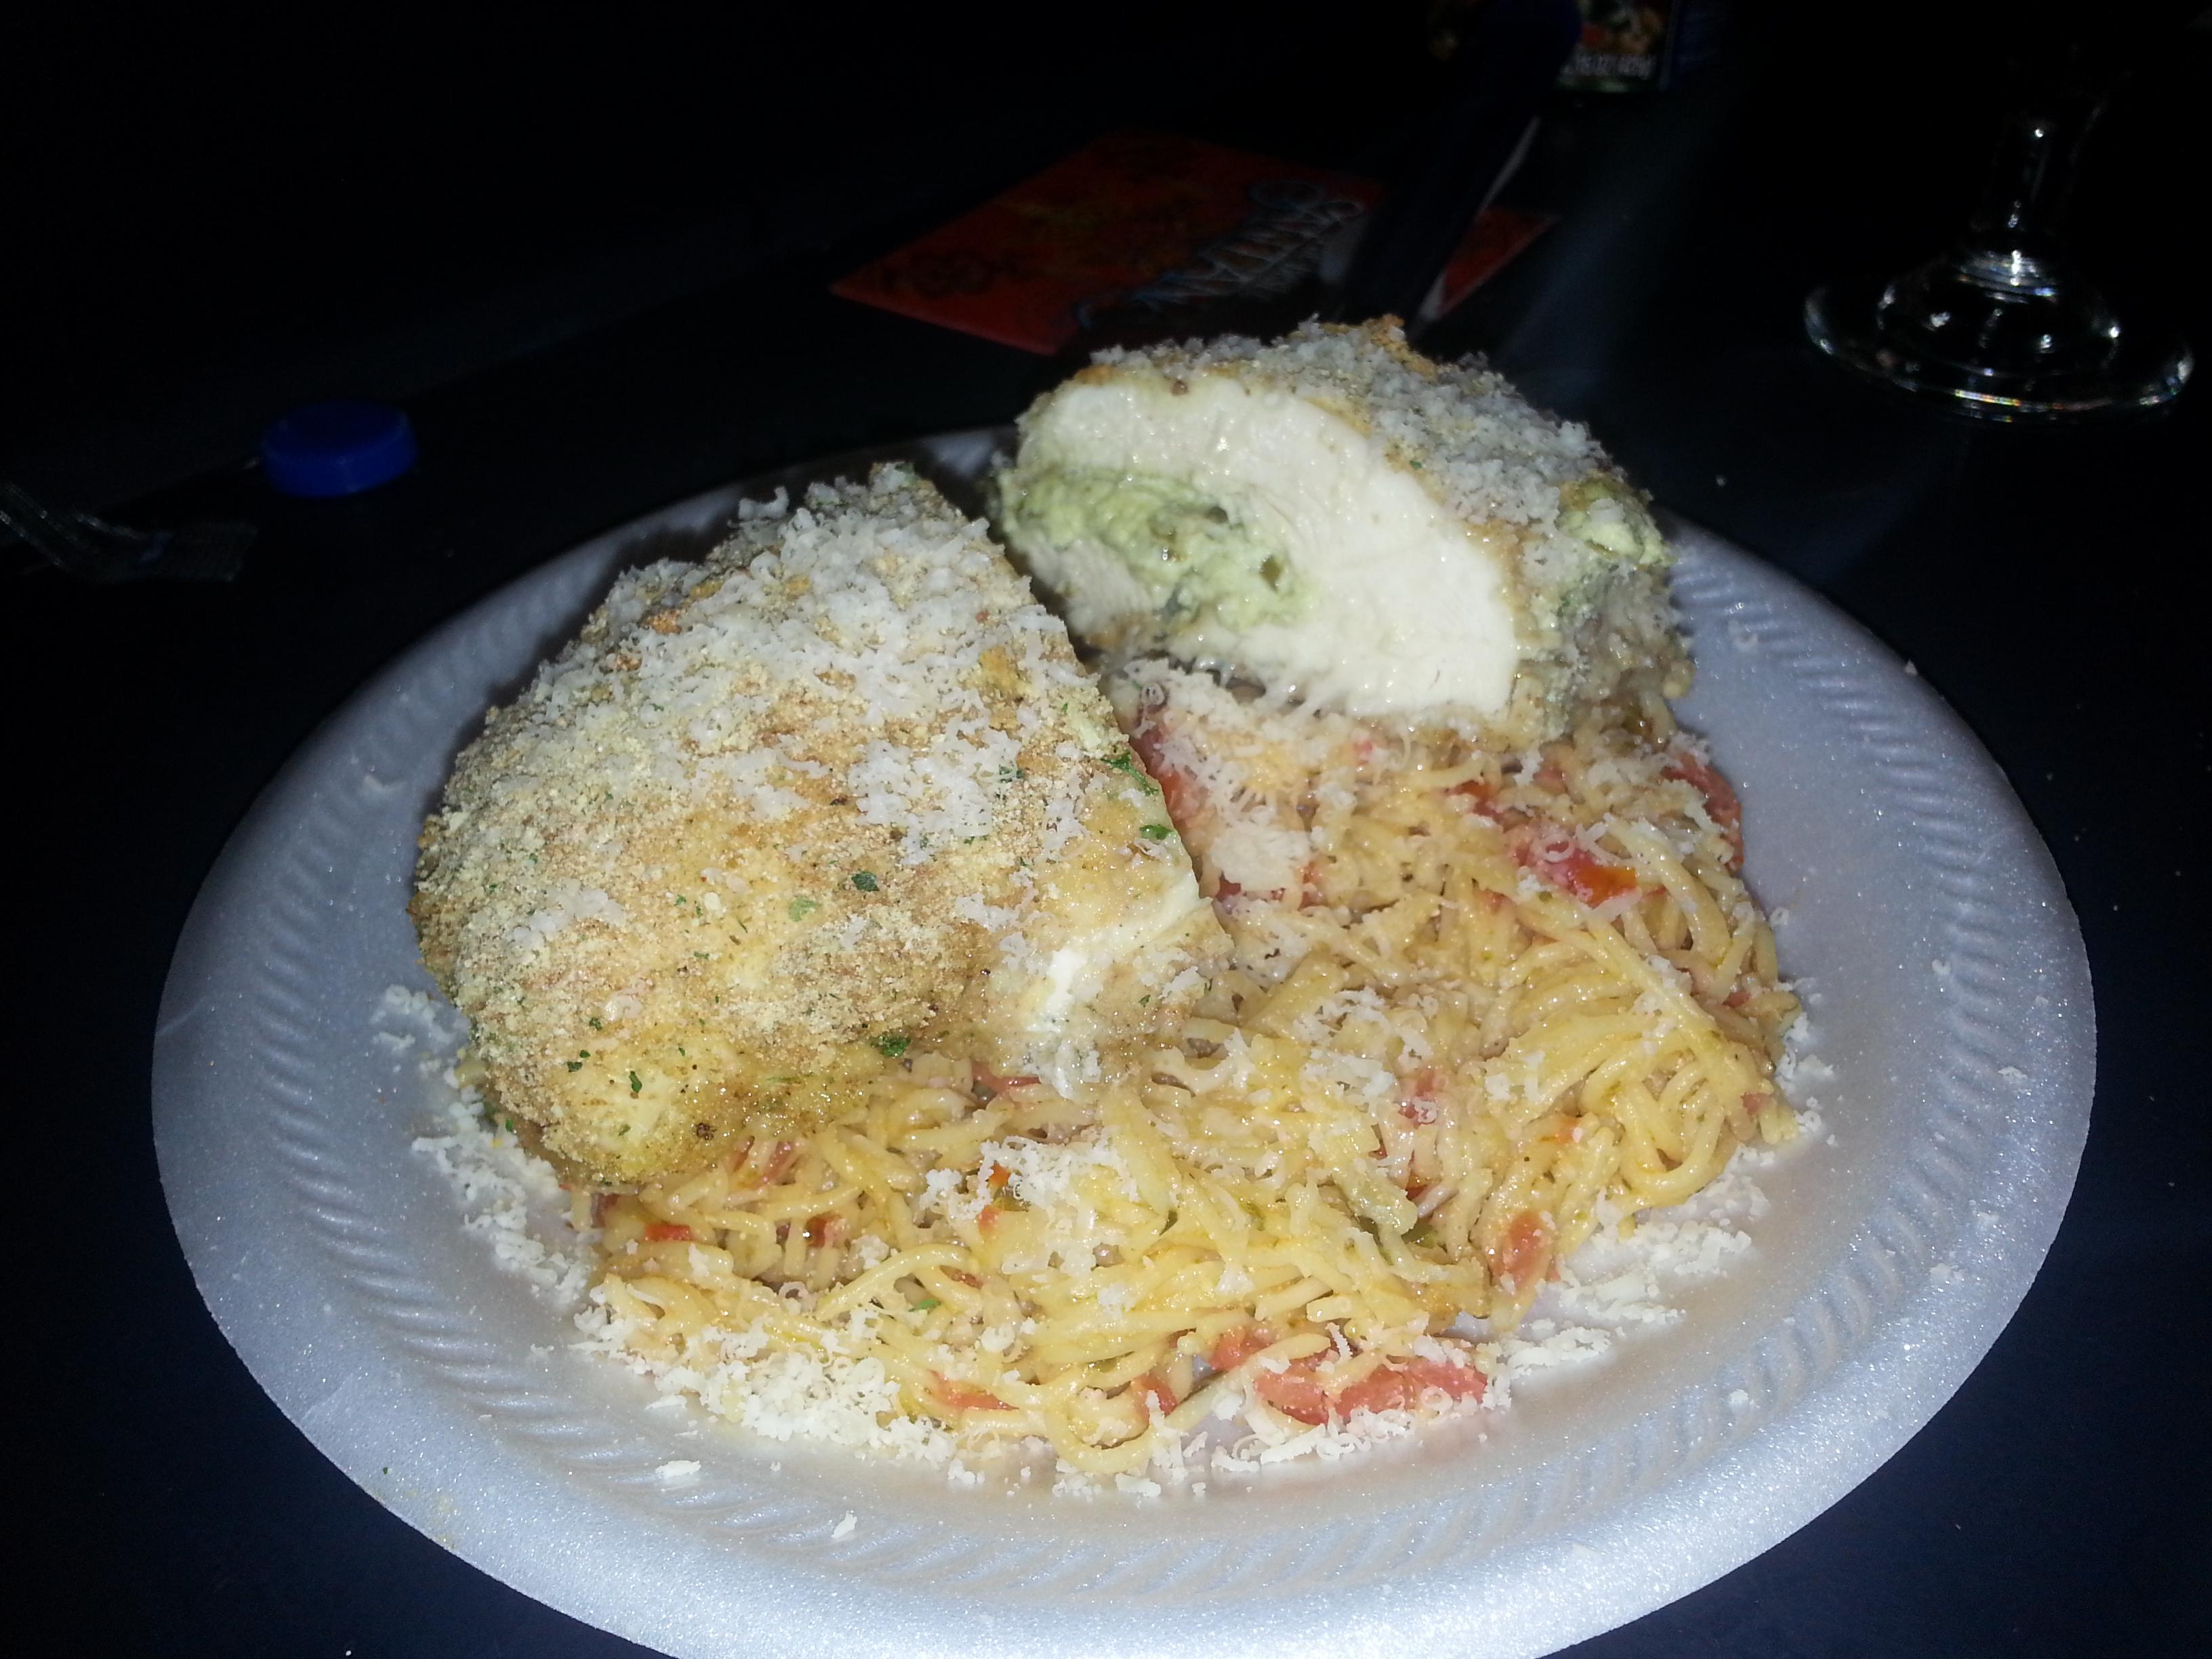 Pesto and Ricotta Stuffed Chicken